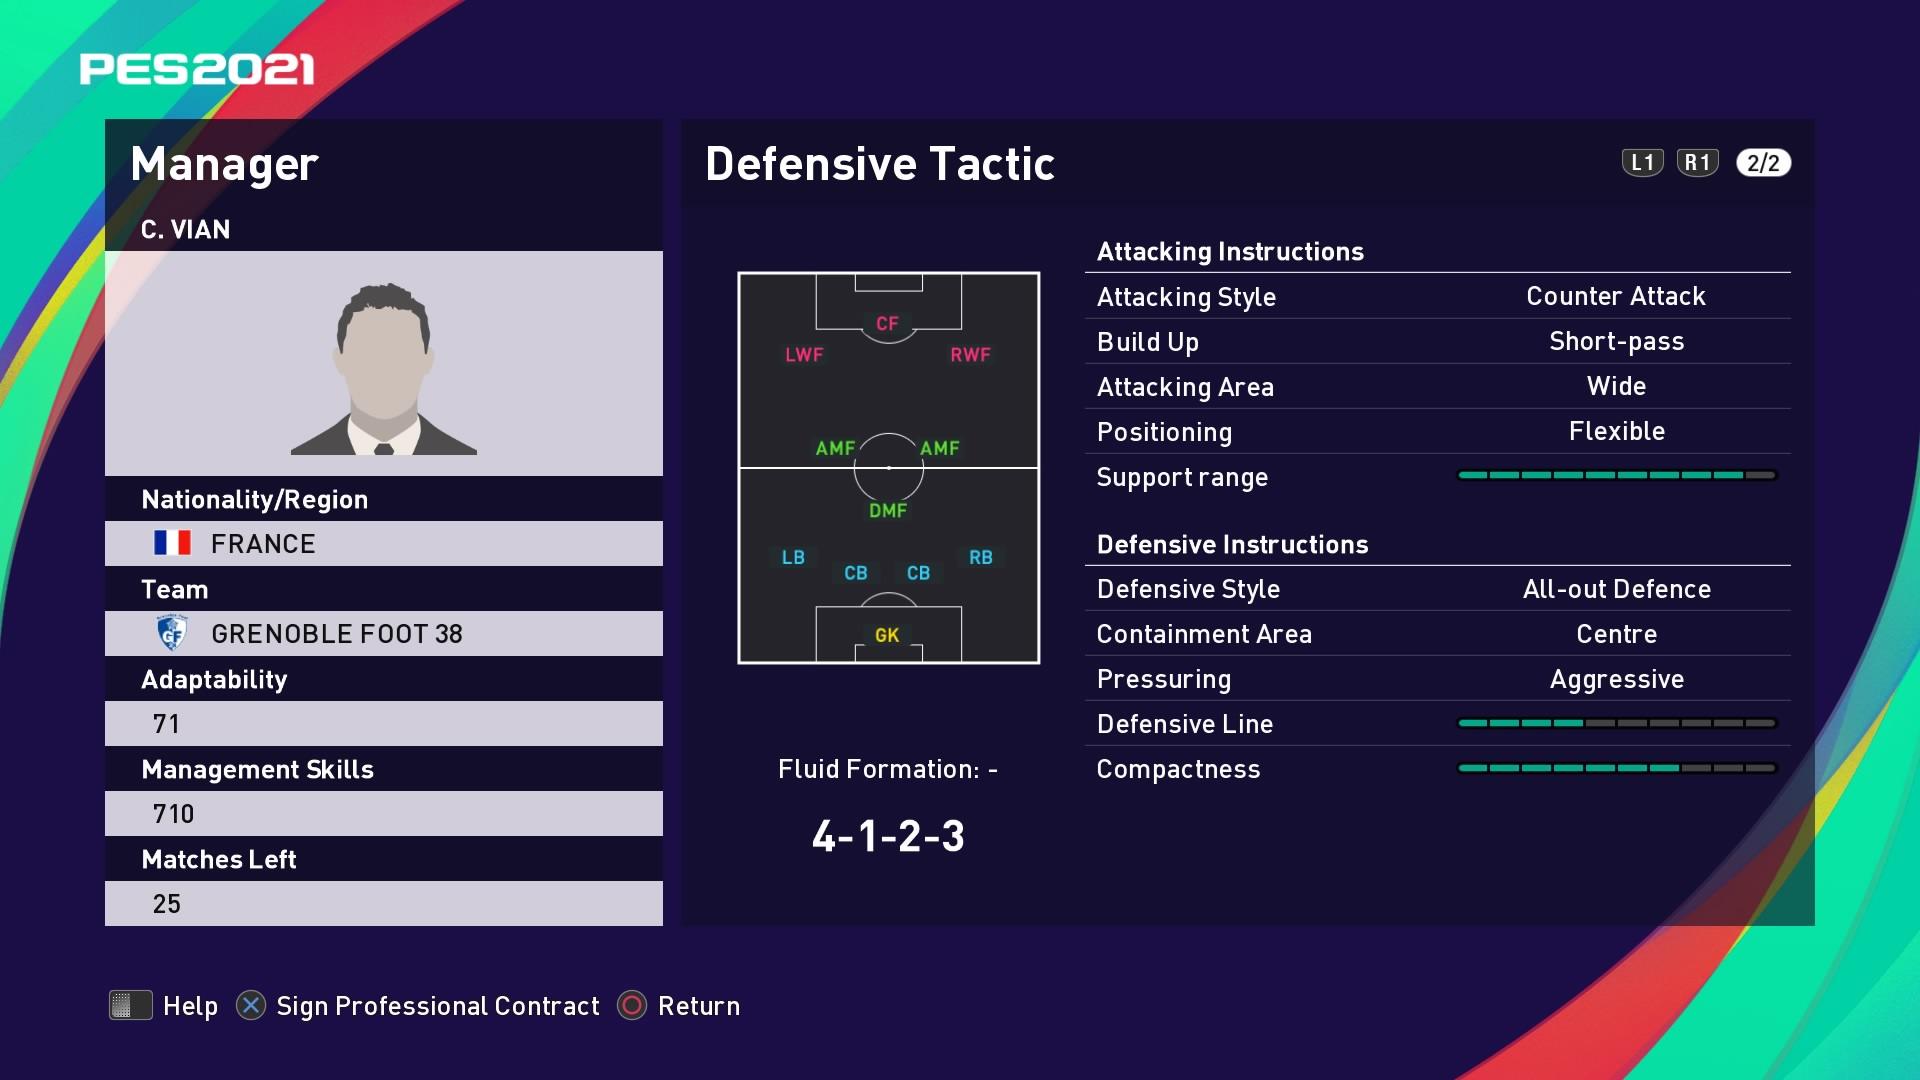 C. Vian (Philippe Hinschberger) Defensive Tactic in PES 2021 myClub